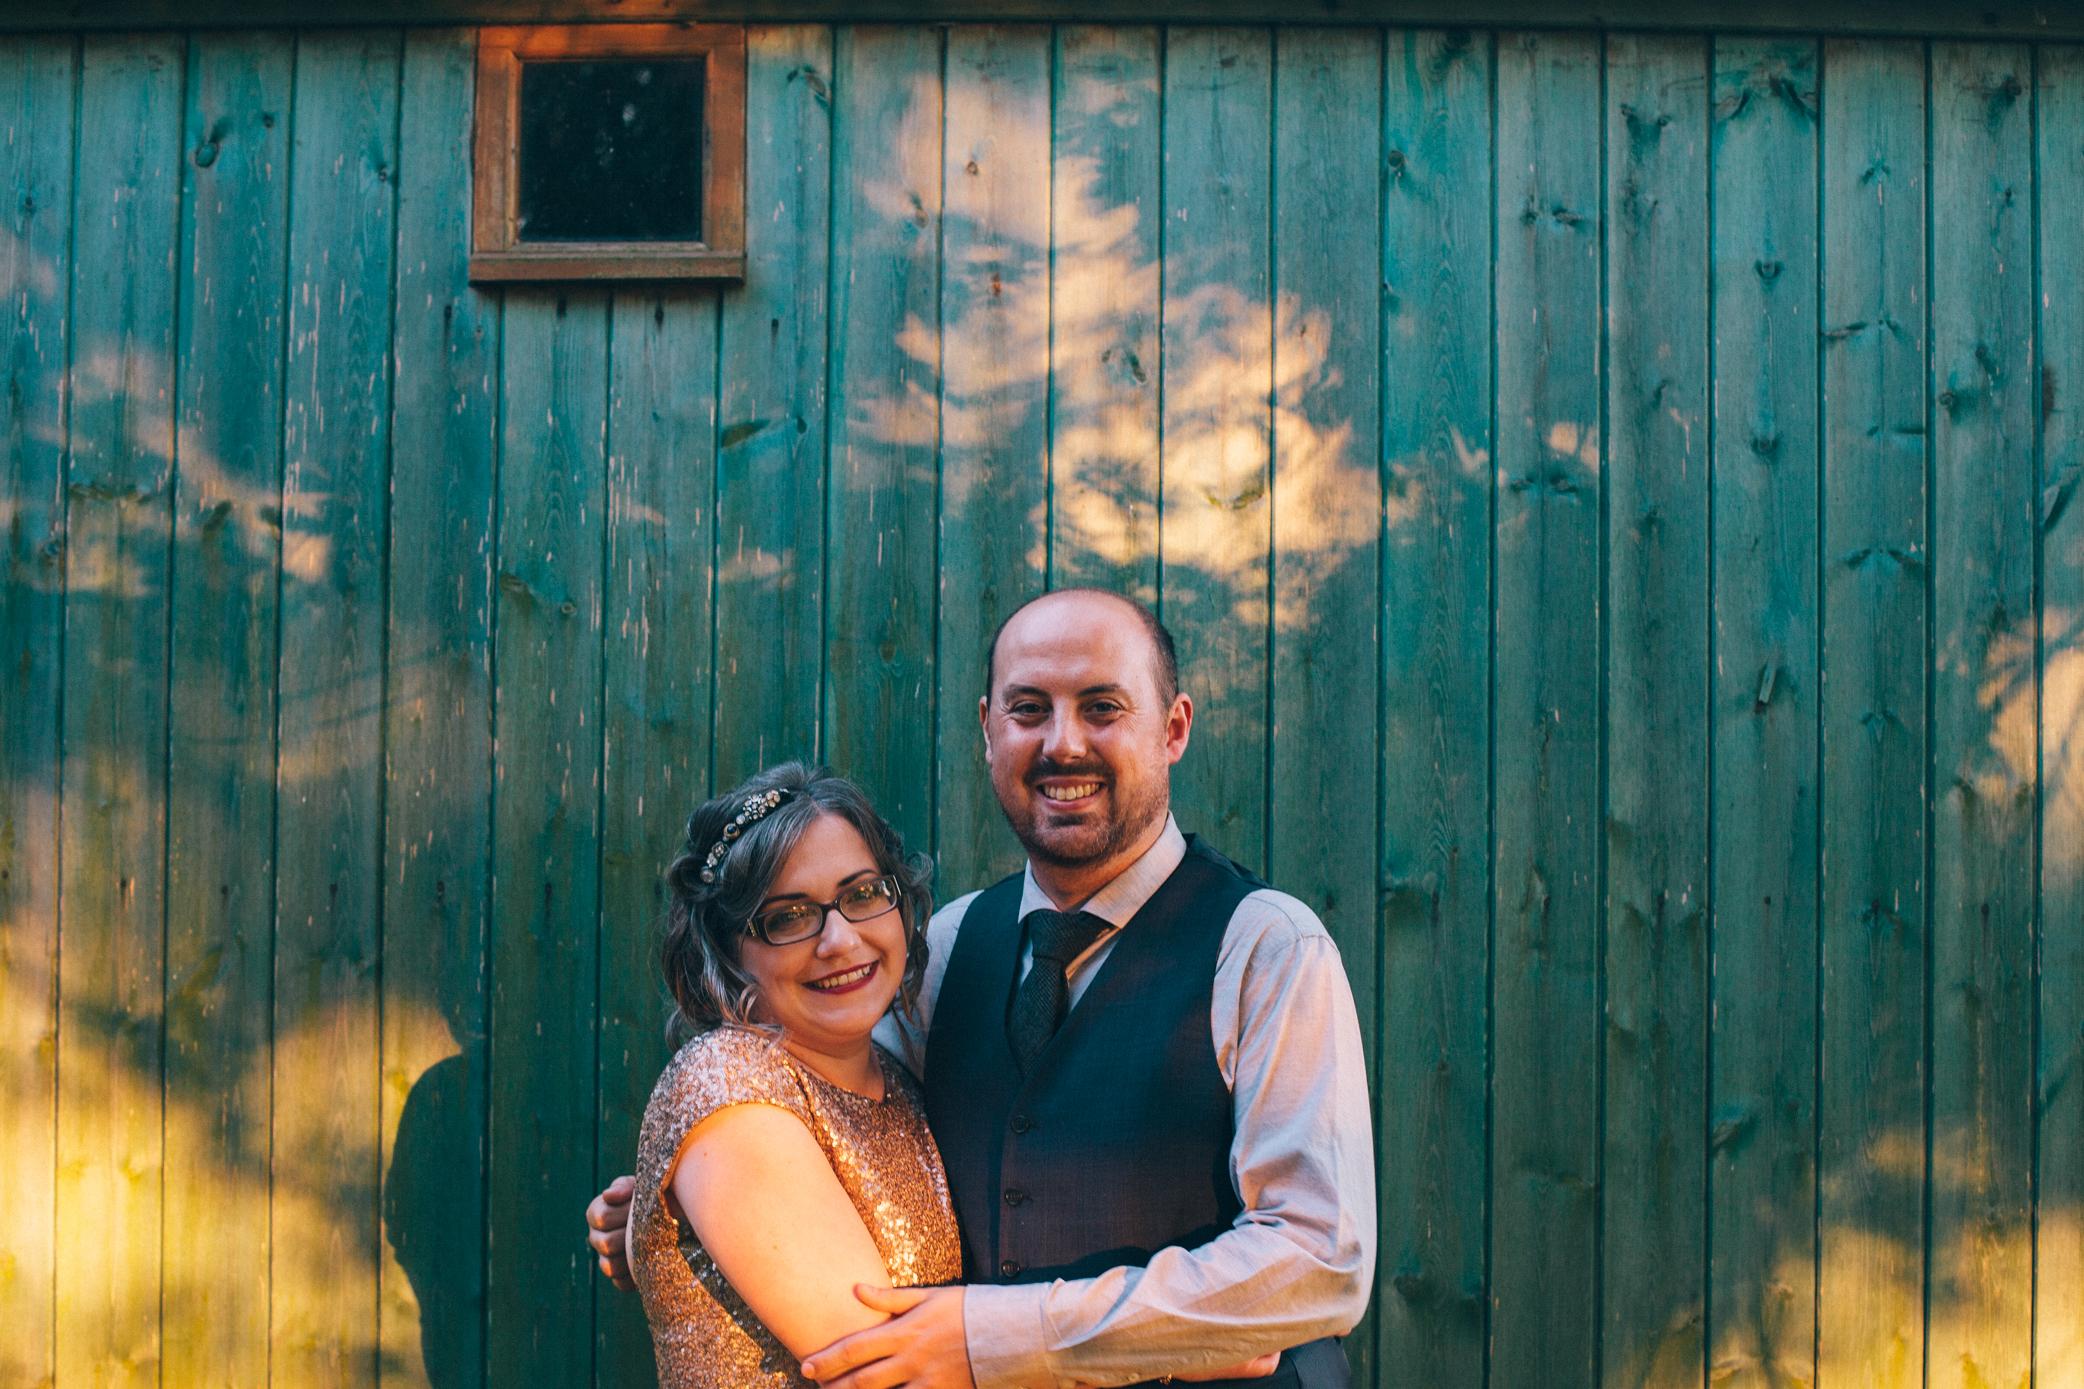 94_Katherine_Mager_Norfolk_Wedding_Photographer_Rhianne_Thomas.jpg